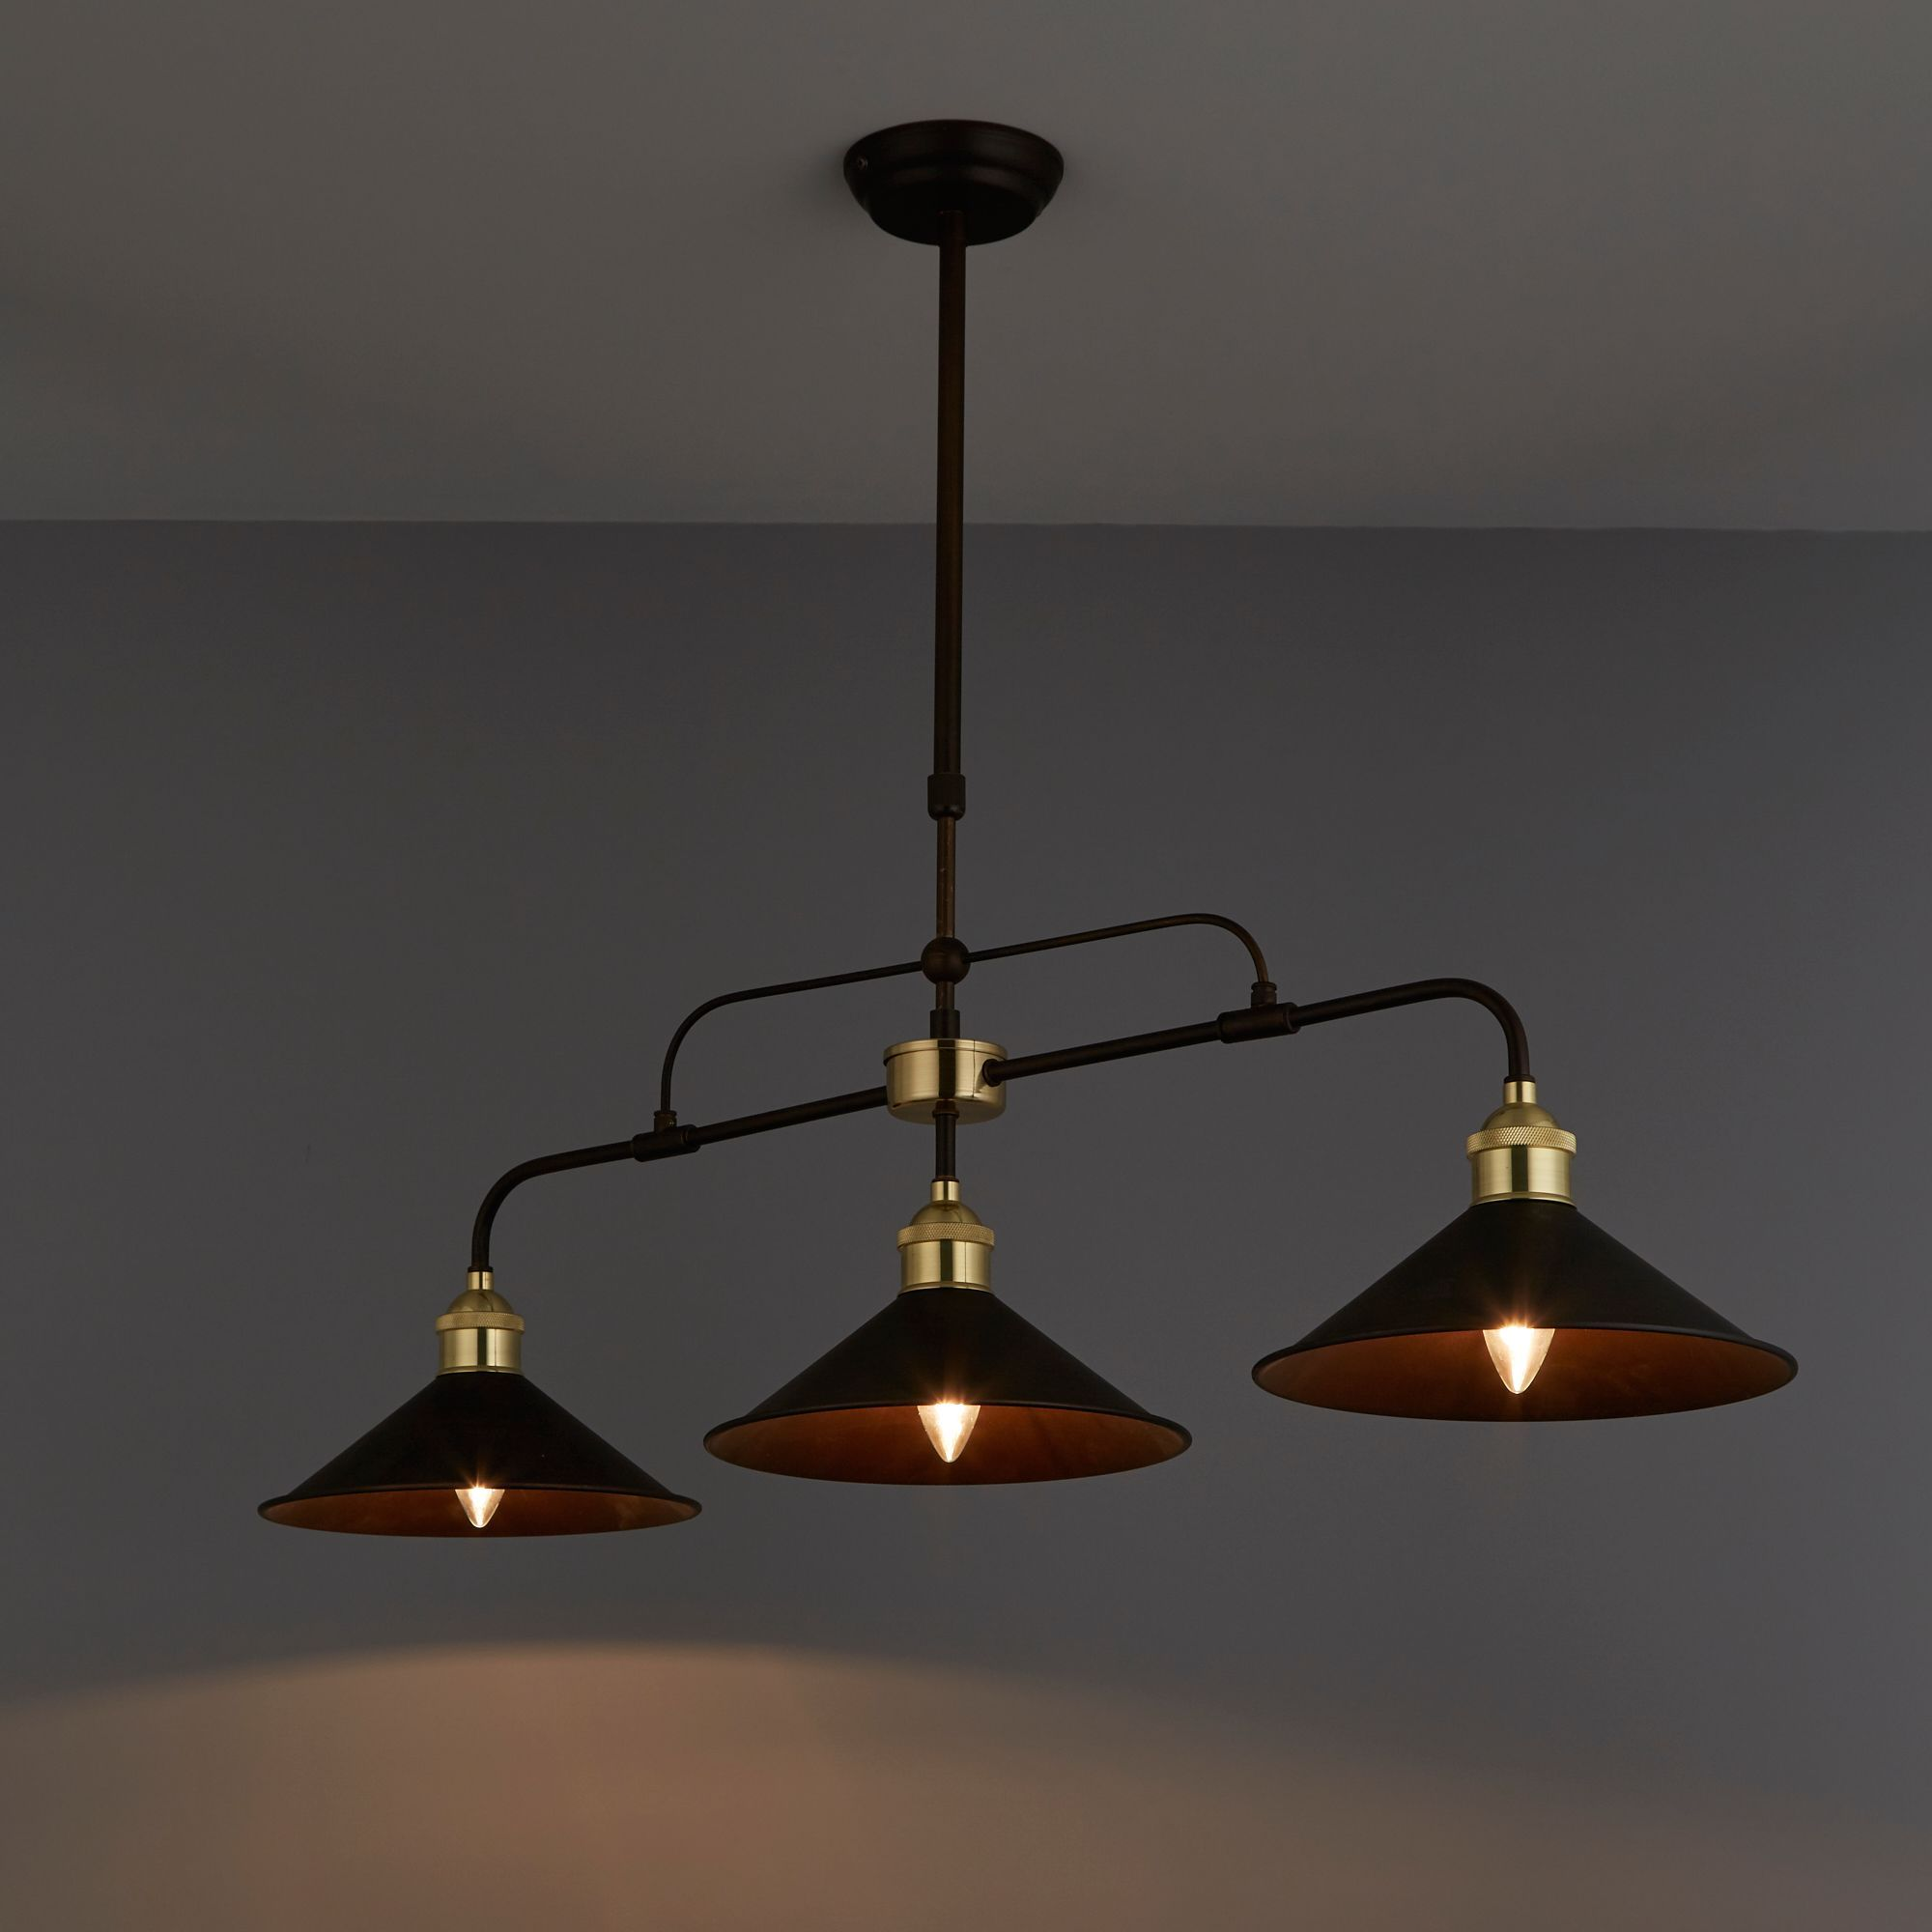 Alfie Bronze Effect 3 Lamp Pendant Ceiling Light Departments Diy At B Amp Q Ceiling Lights Ceiling Lights Diy Ceiling Pendant Lights Bq living room lights